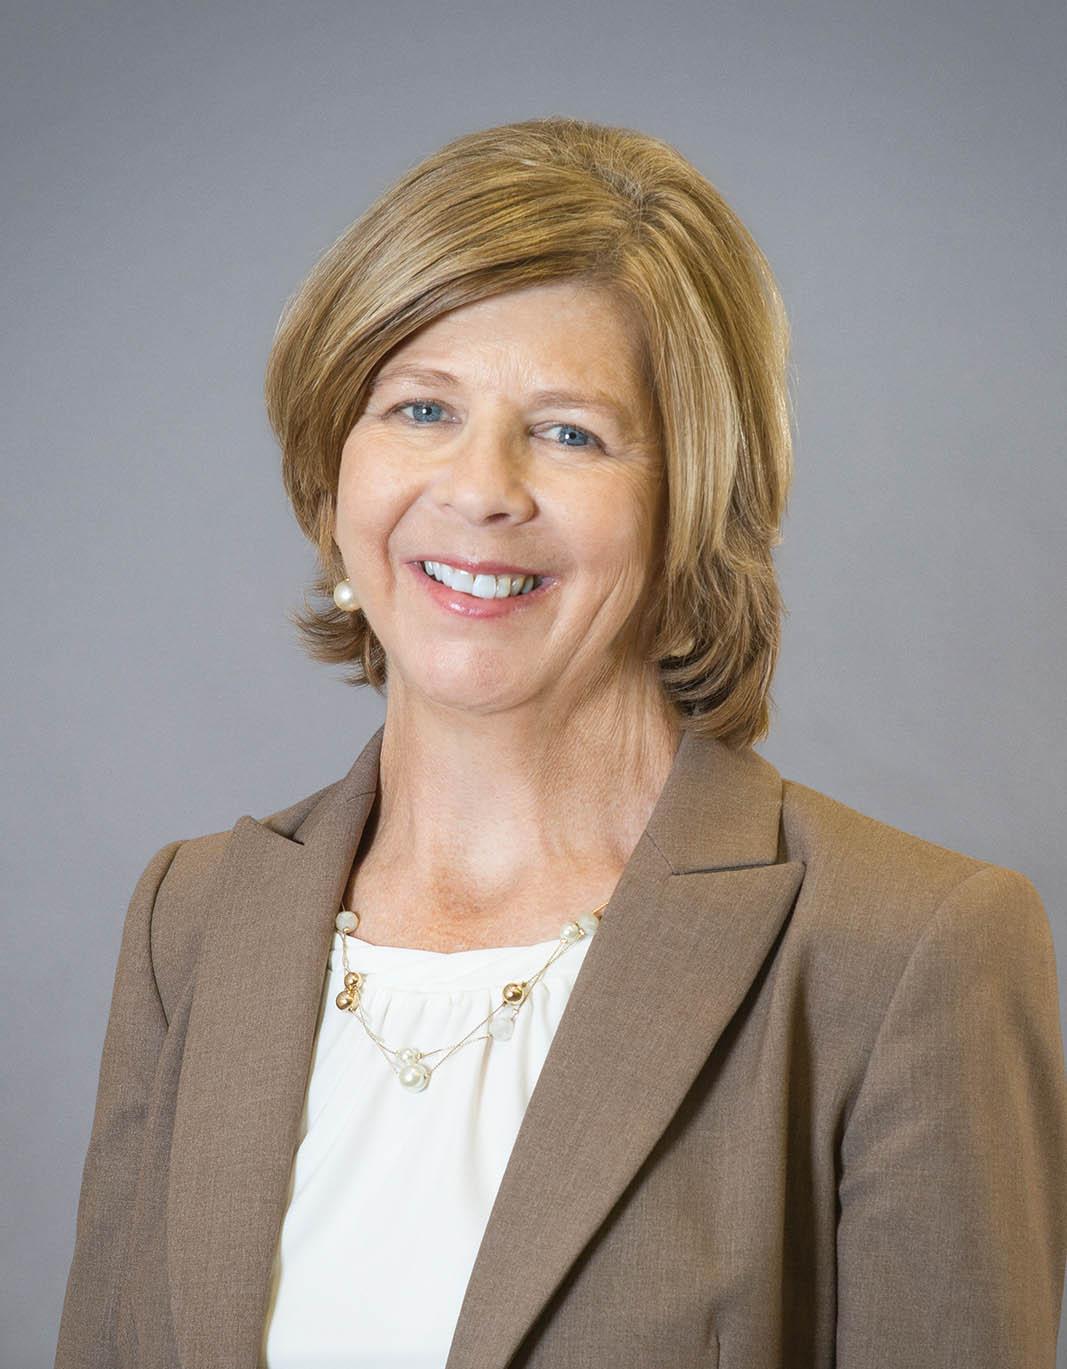 Kathy Blumreich Monona Bank Executive Banking